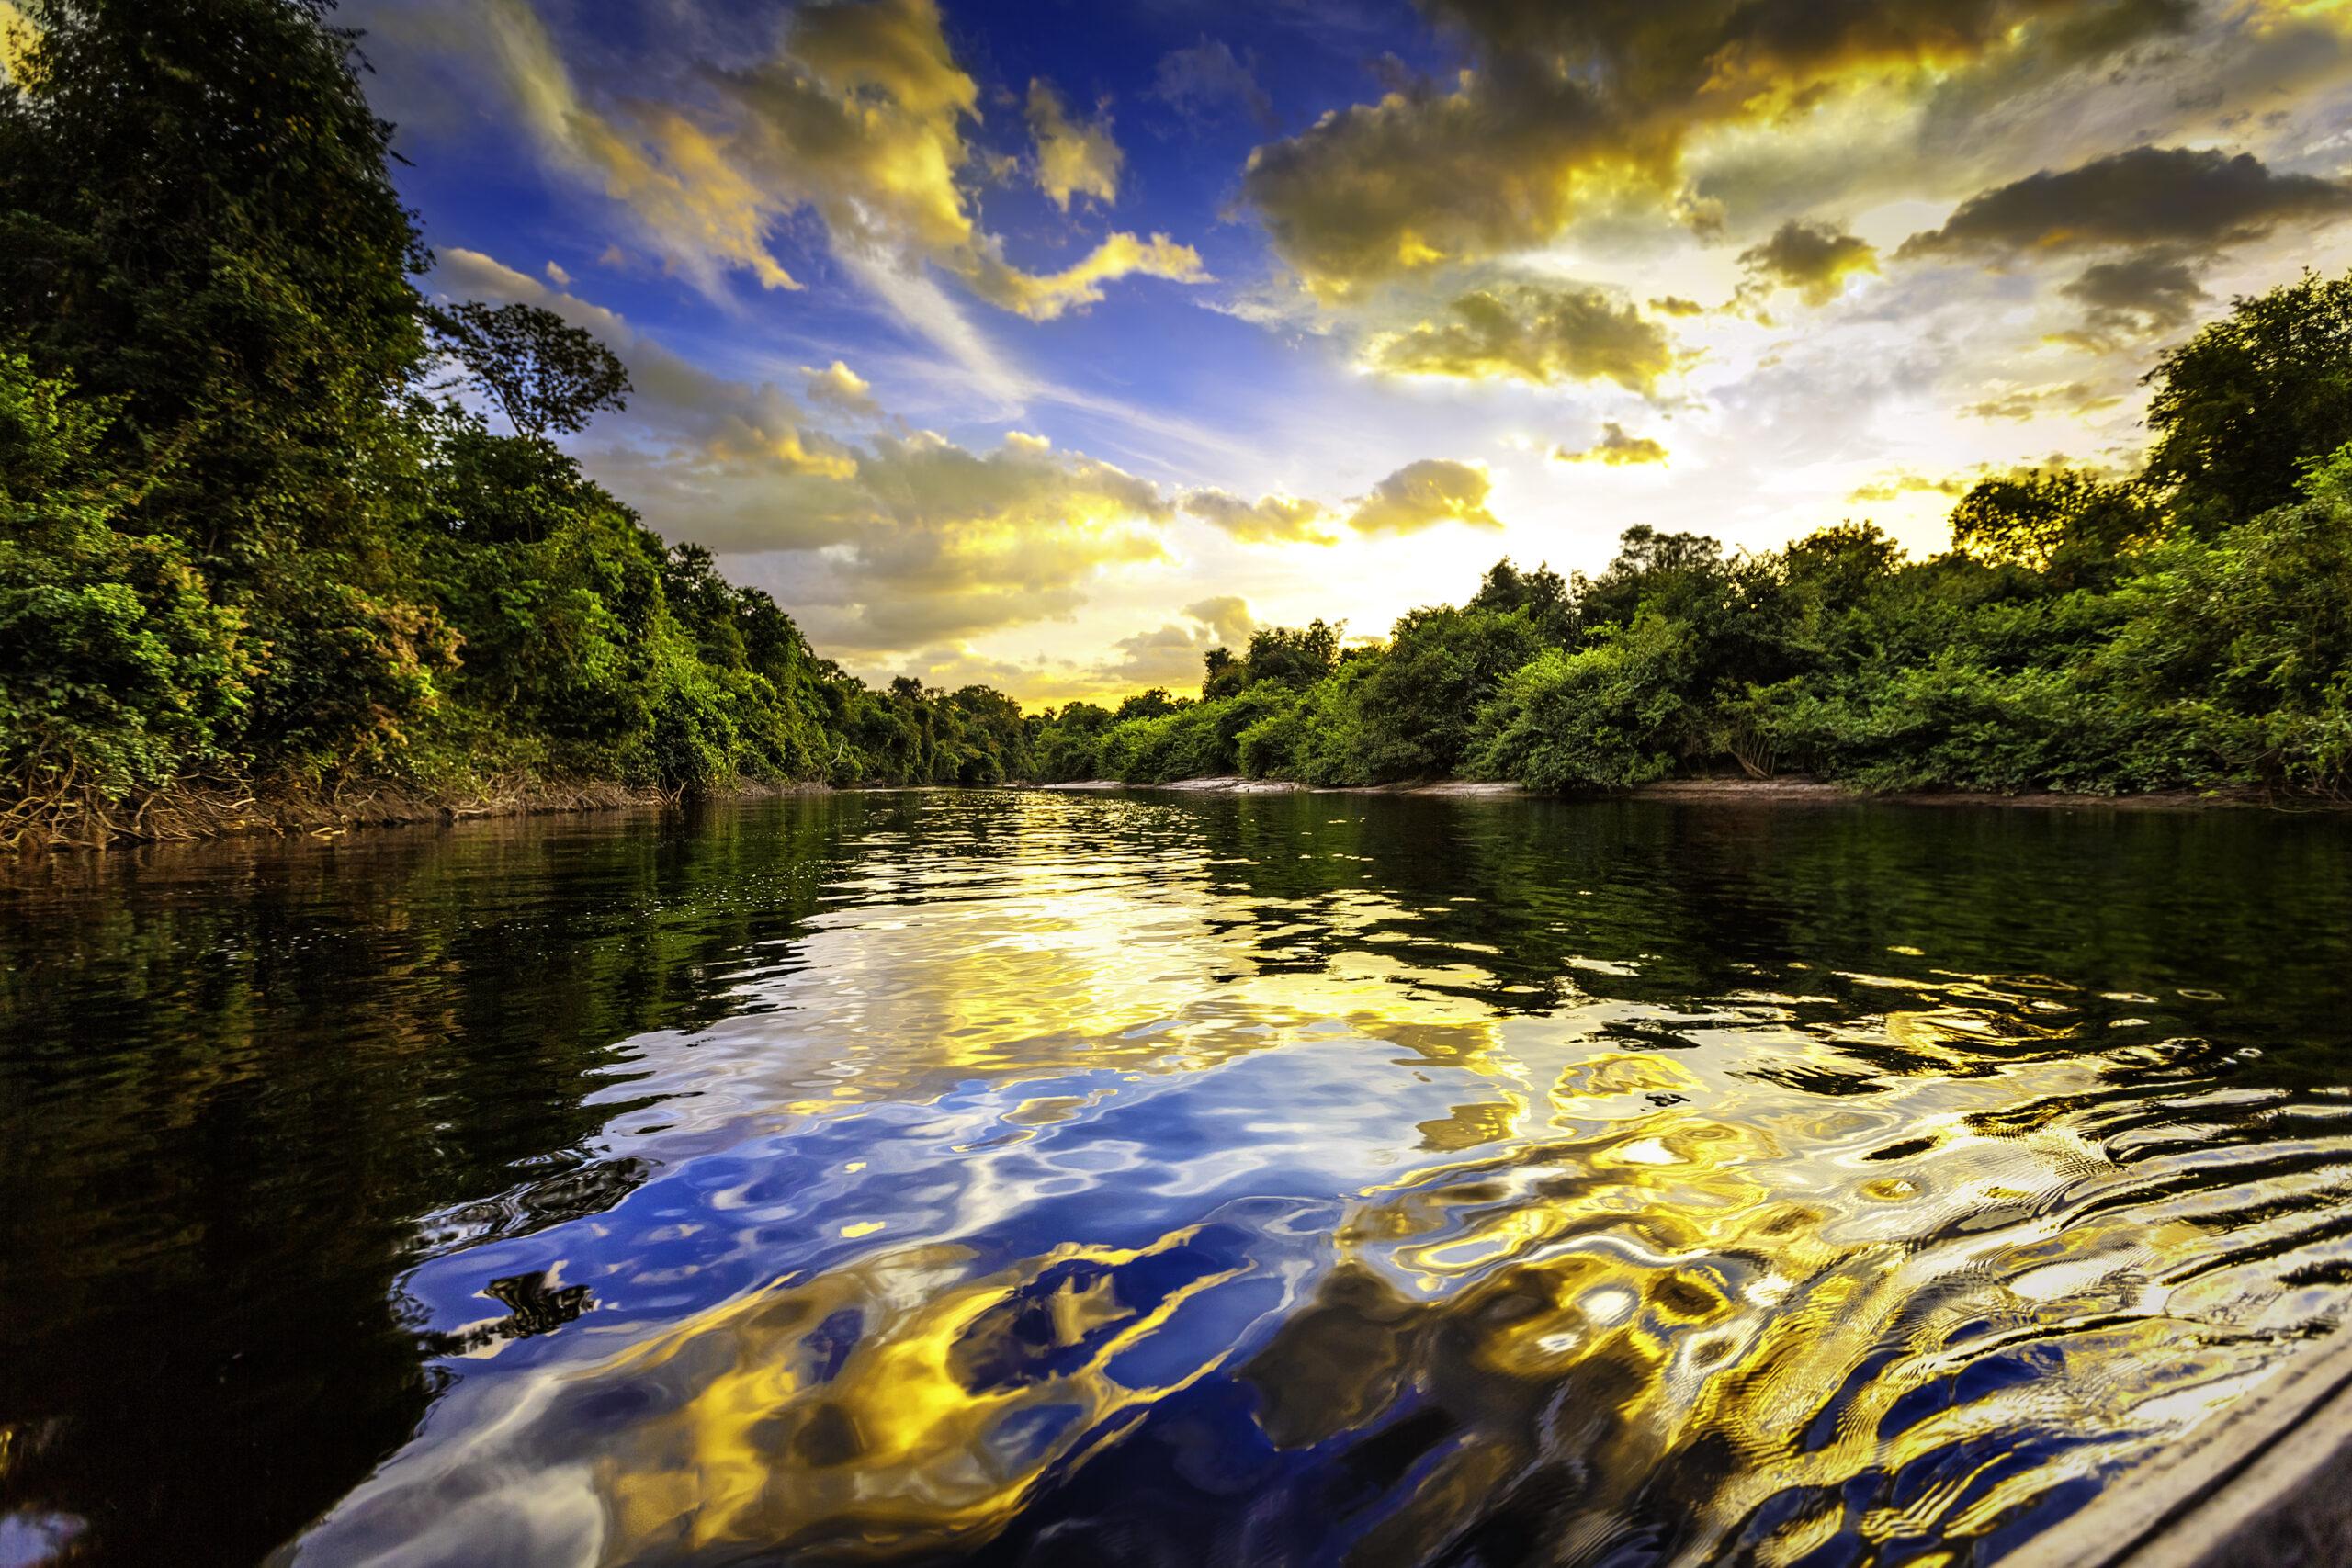 The Amazon's biodiversity: The real winning lottery ticket